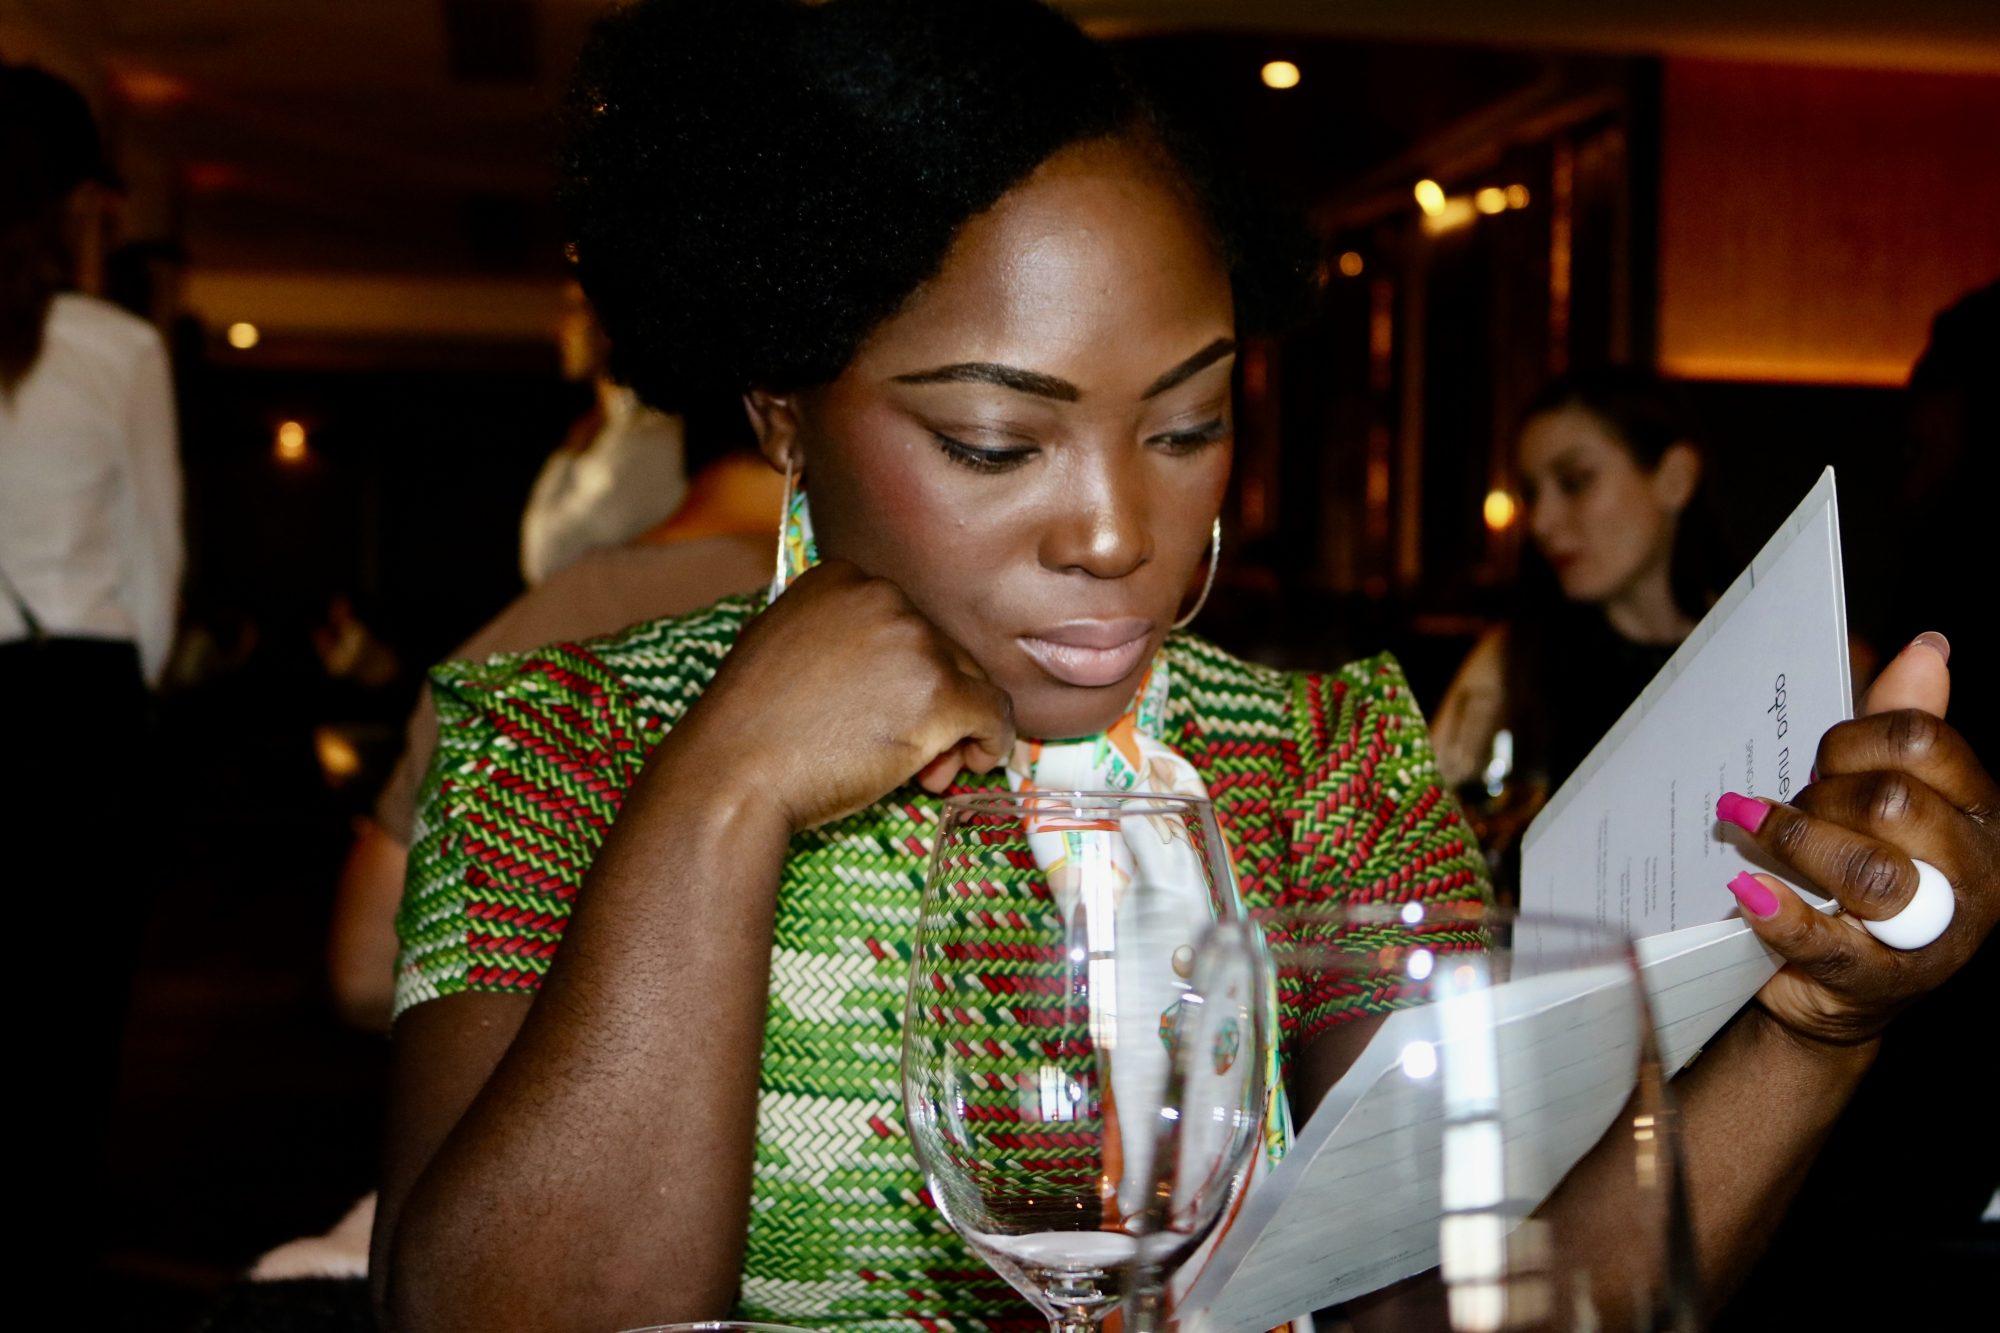 Cameroonian PR Guru Cynthia Tabe at Aqua Nueva